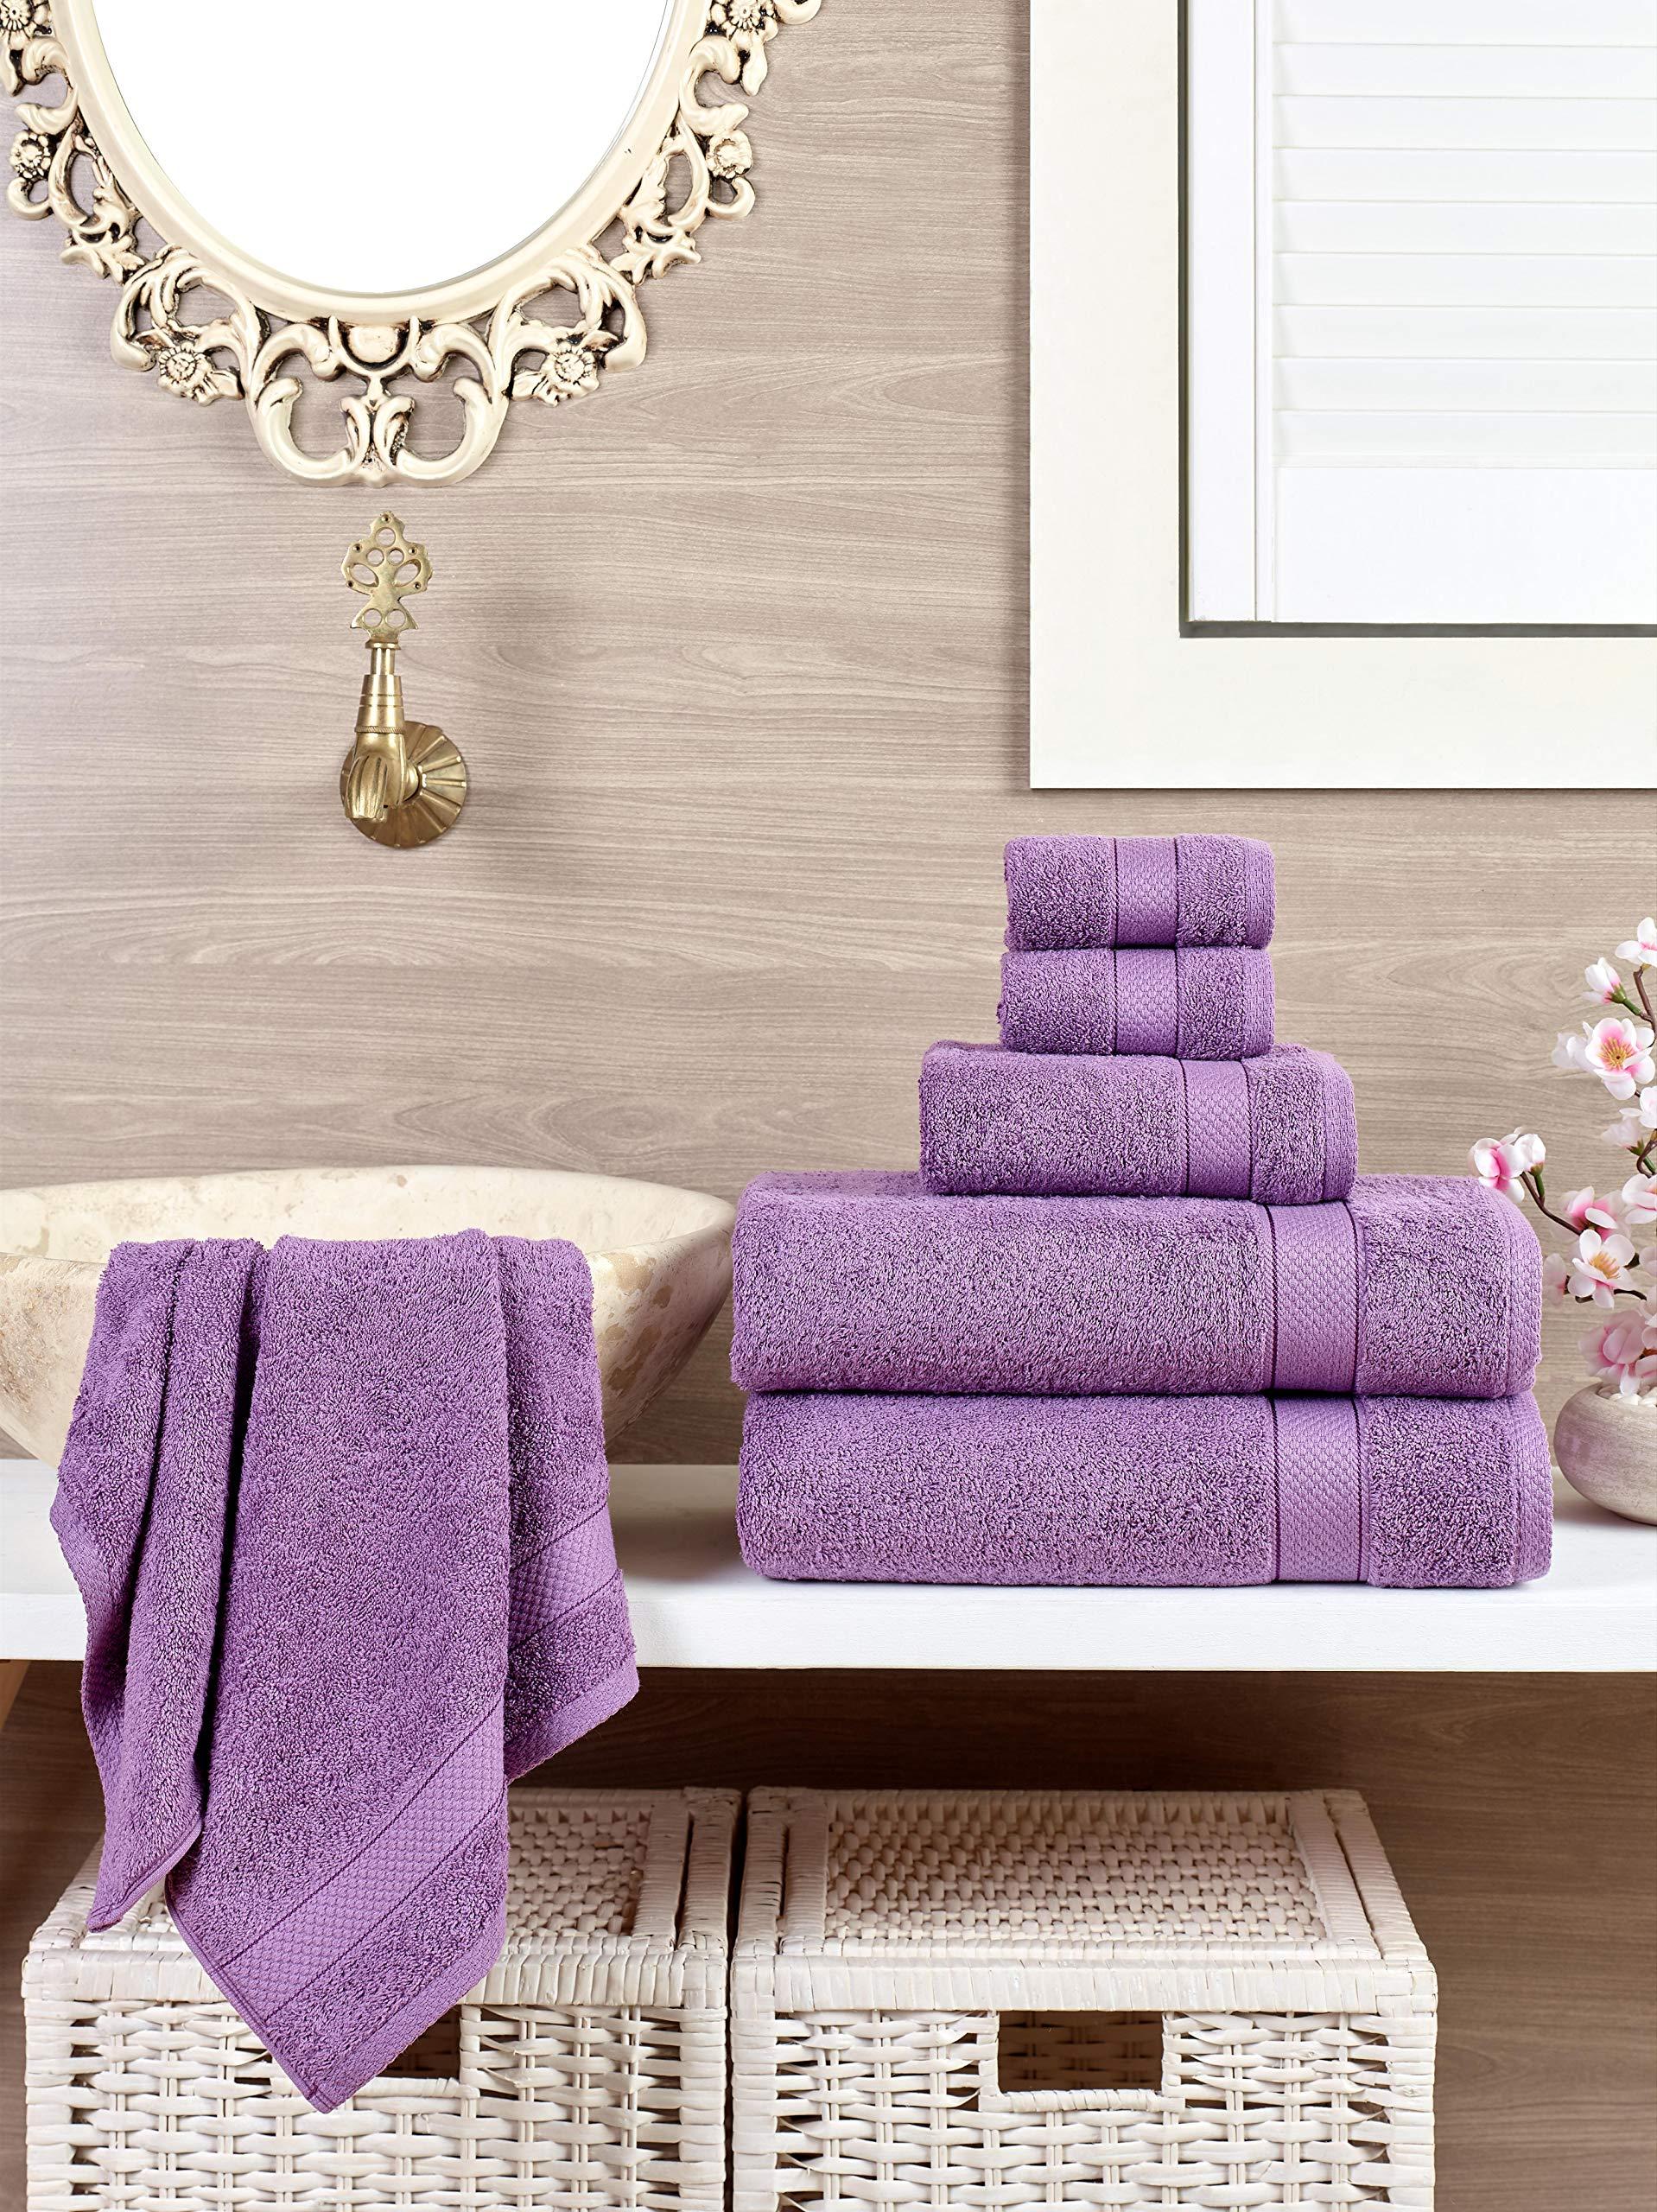 ixirhome Turkish Towel Set 6 Piece,100% Cotton, 2 Bath Towels, 2 Hand Towels 2 Washcloths, Machine Washable, Hotel Quality, Super Soft Highly Absorbent (DARK VIOLET)